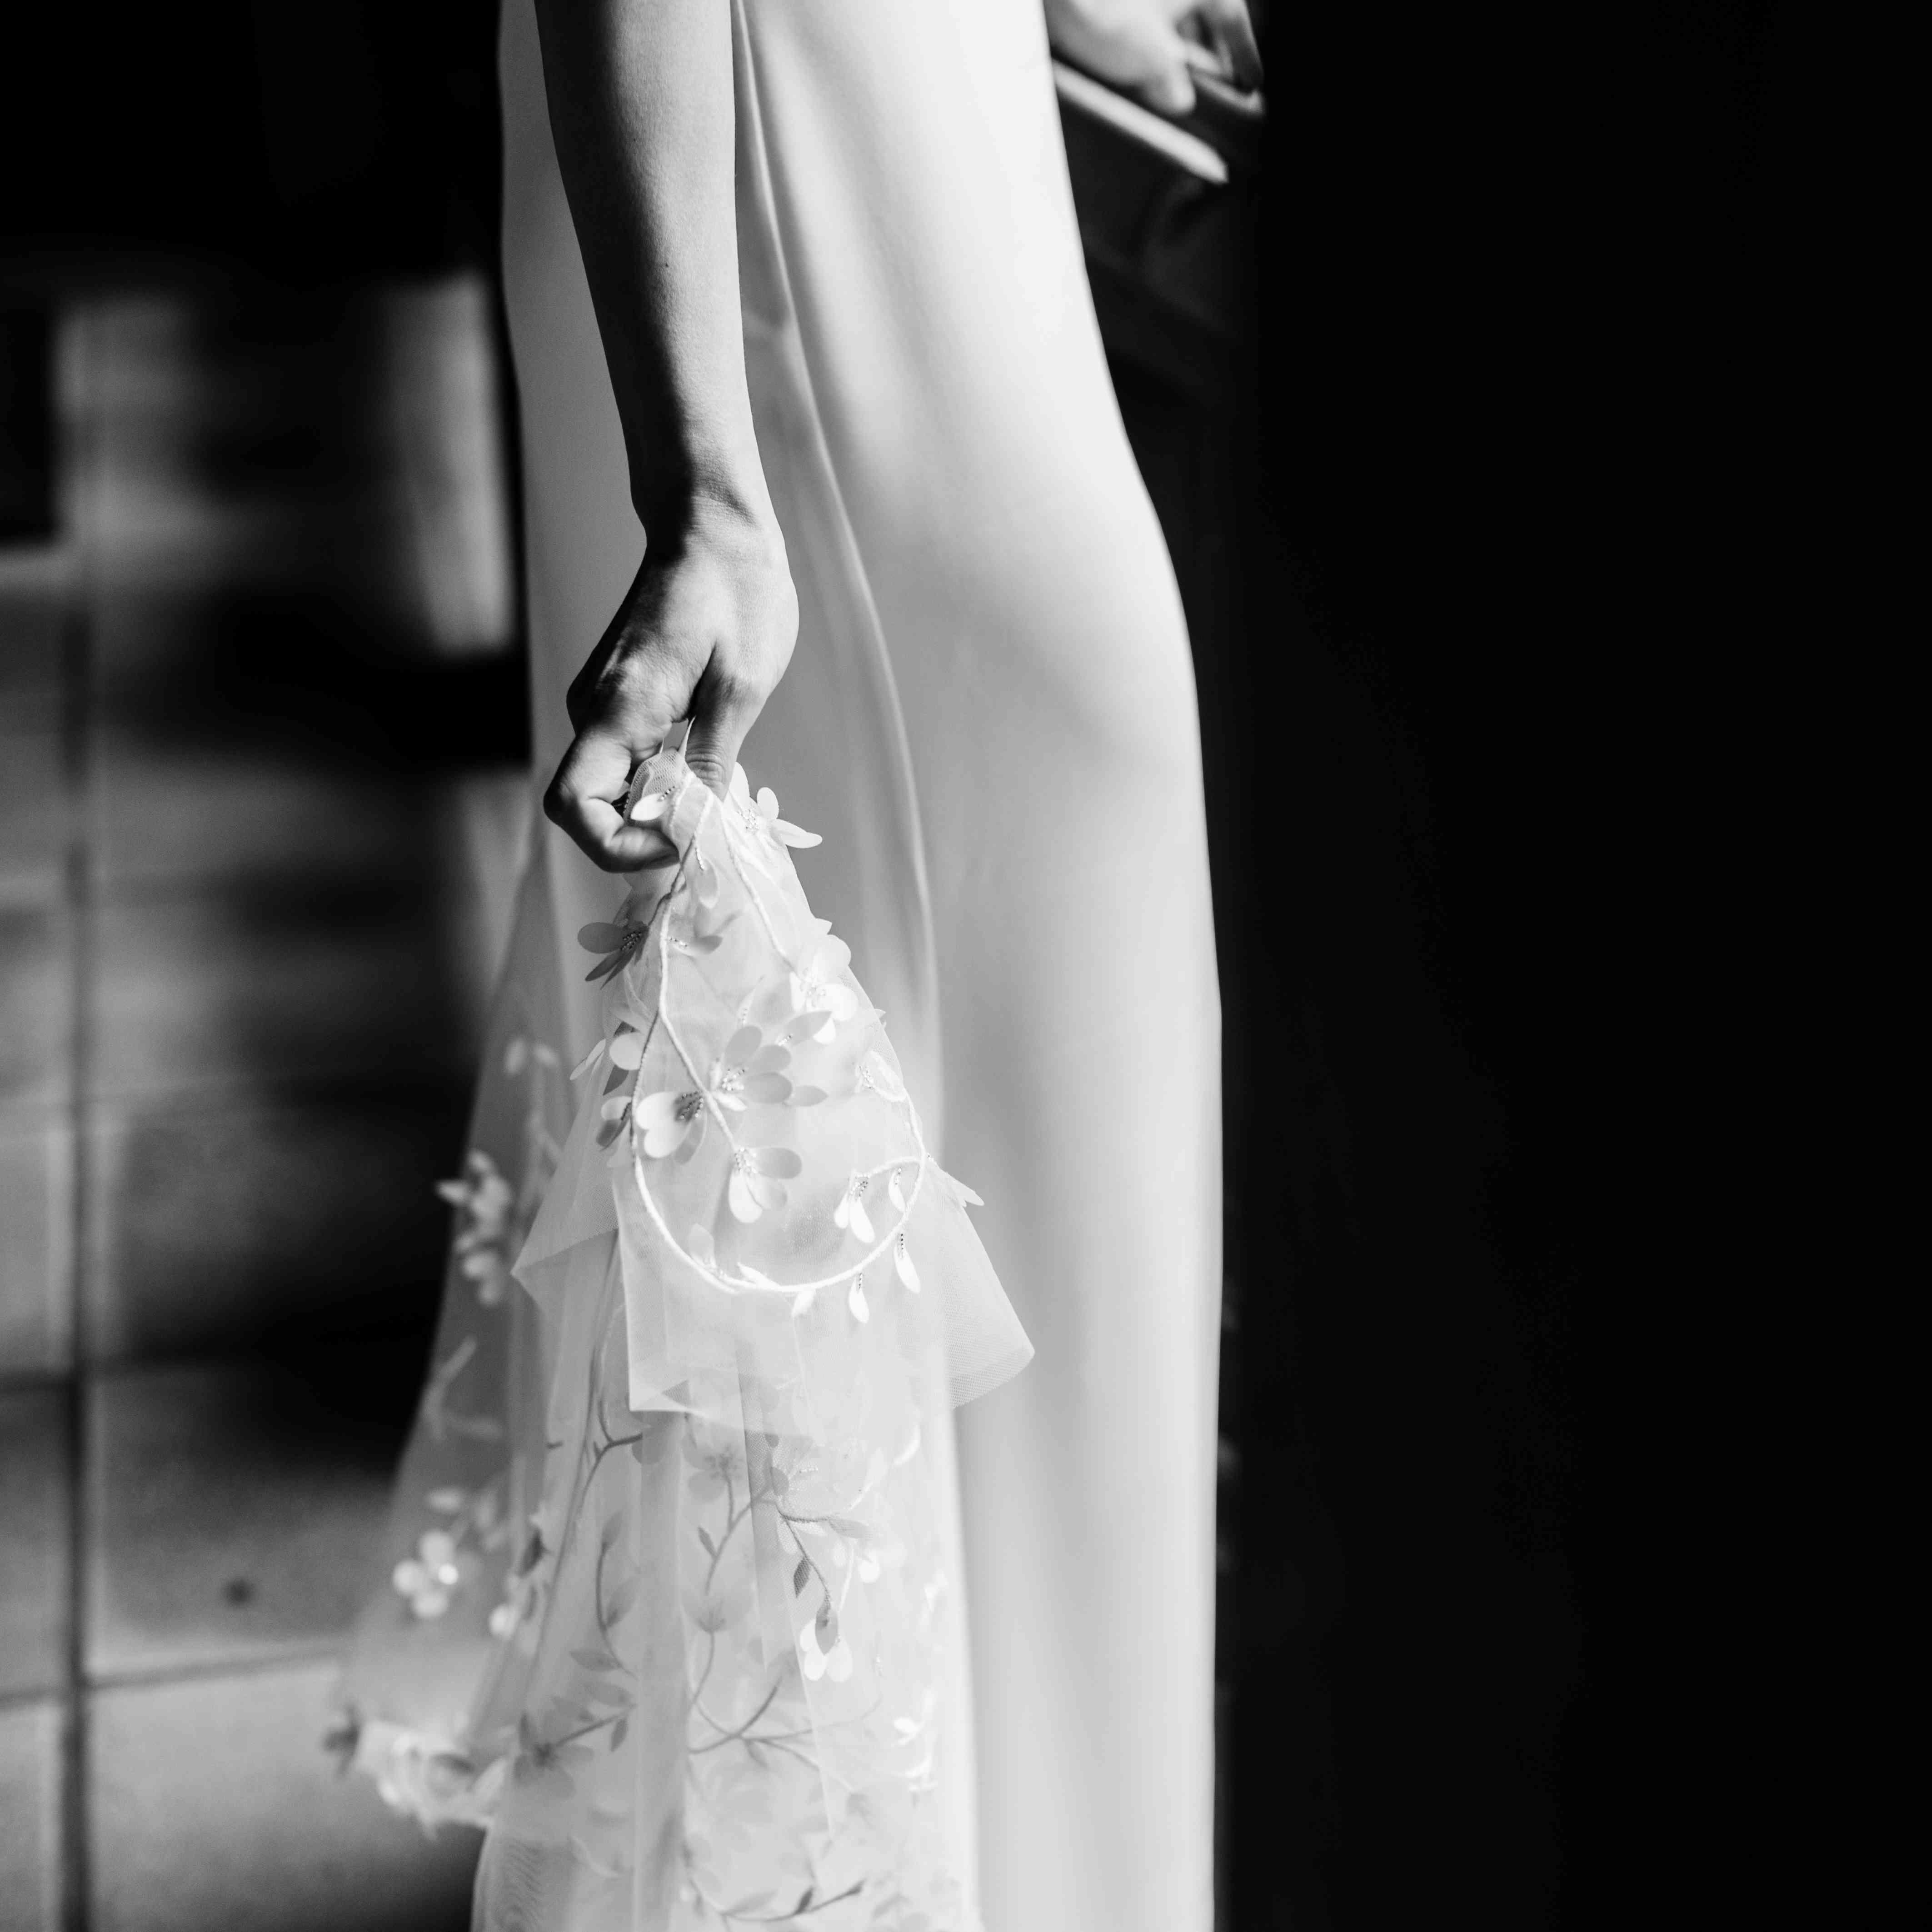 Bride's wedding dress detail